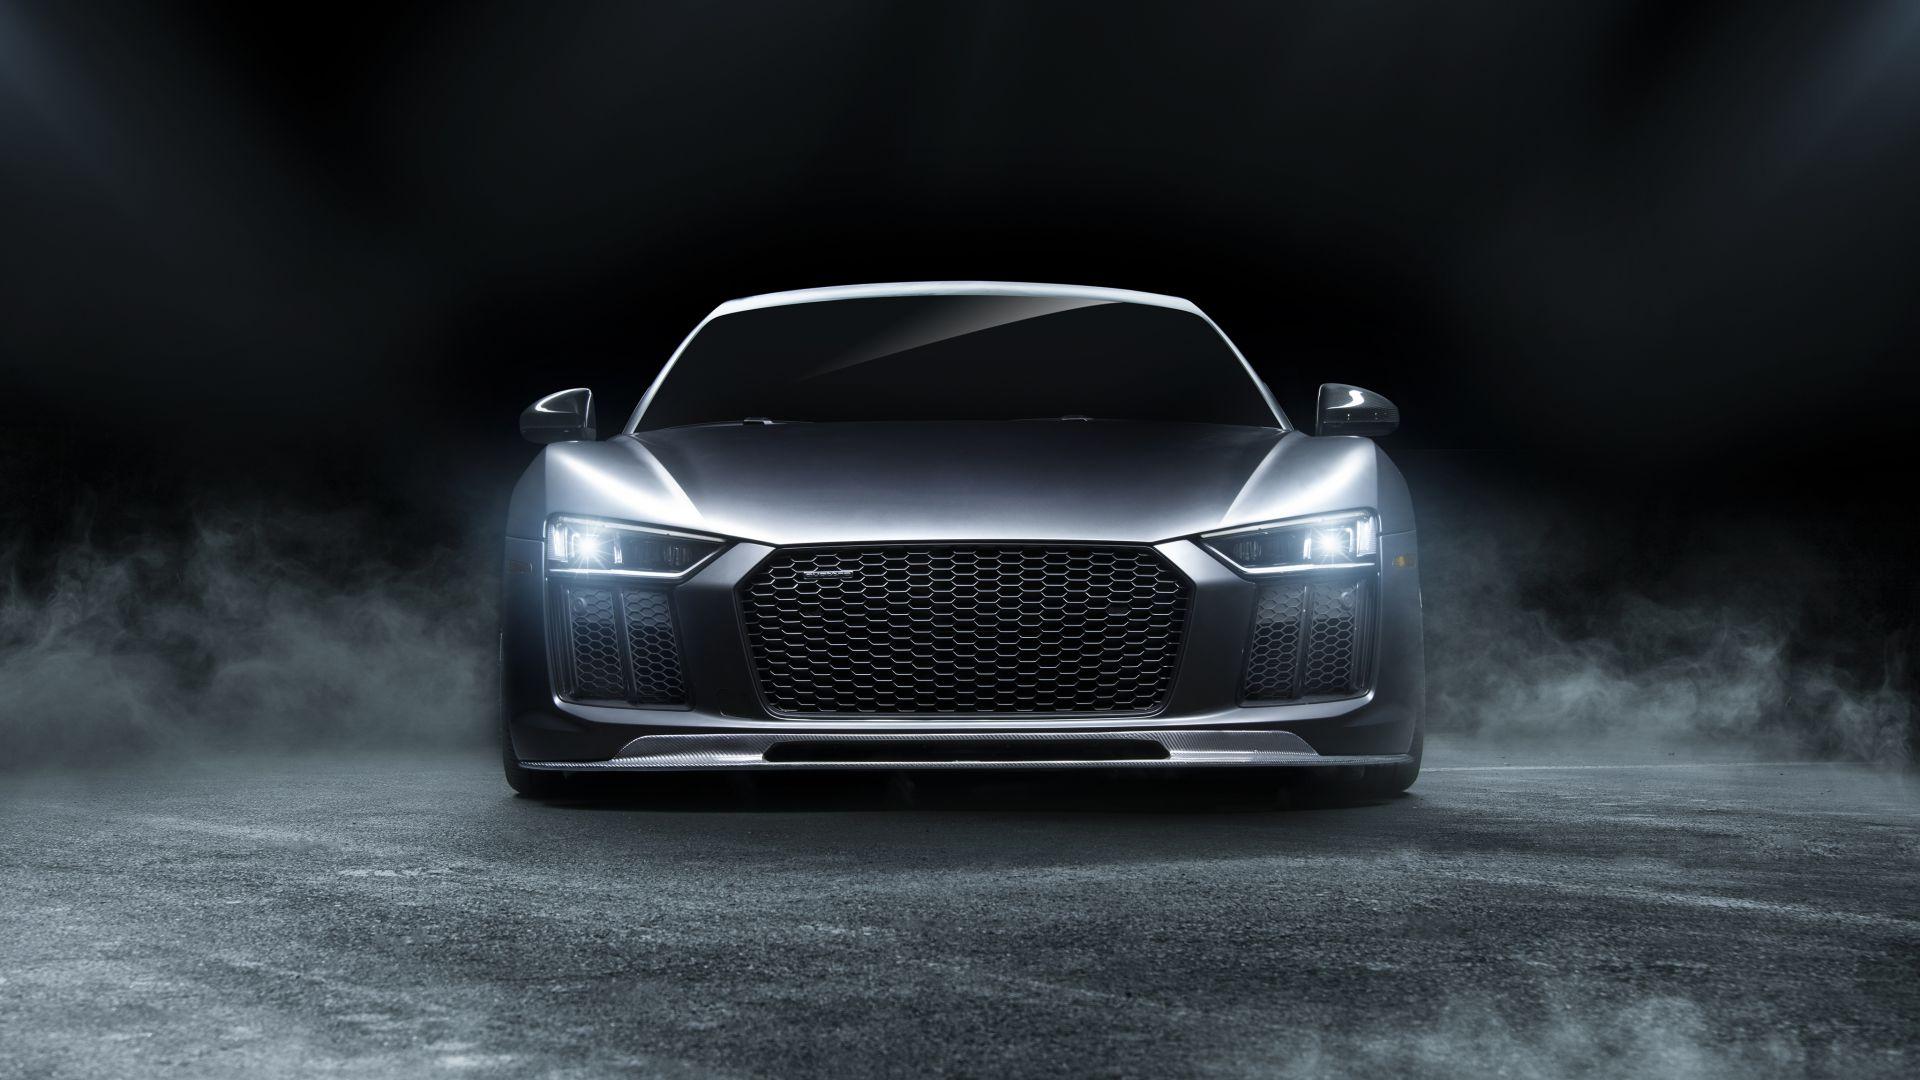 Audi Sports Car Wallpaper Desktop Wallpaper Audi R8 Sports Car Front View Hd